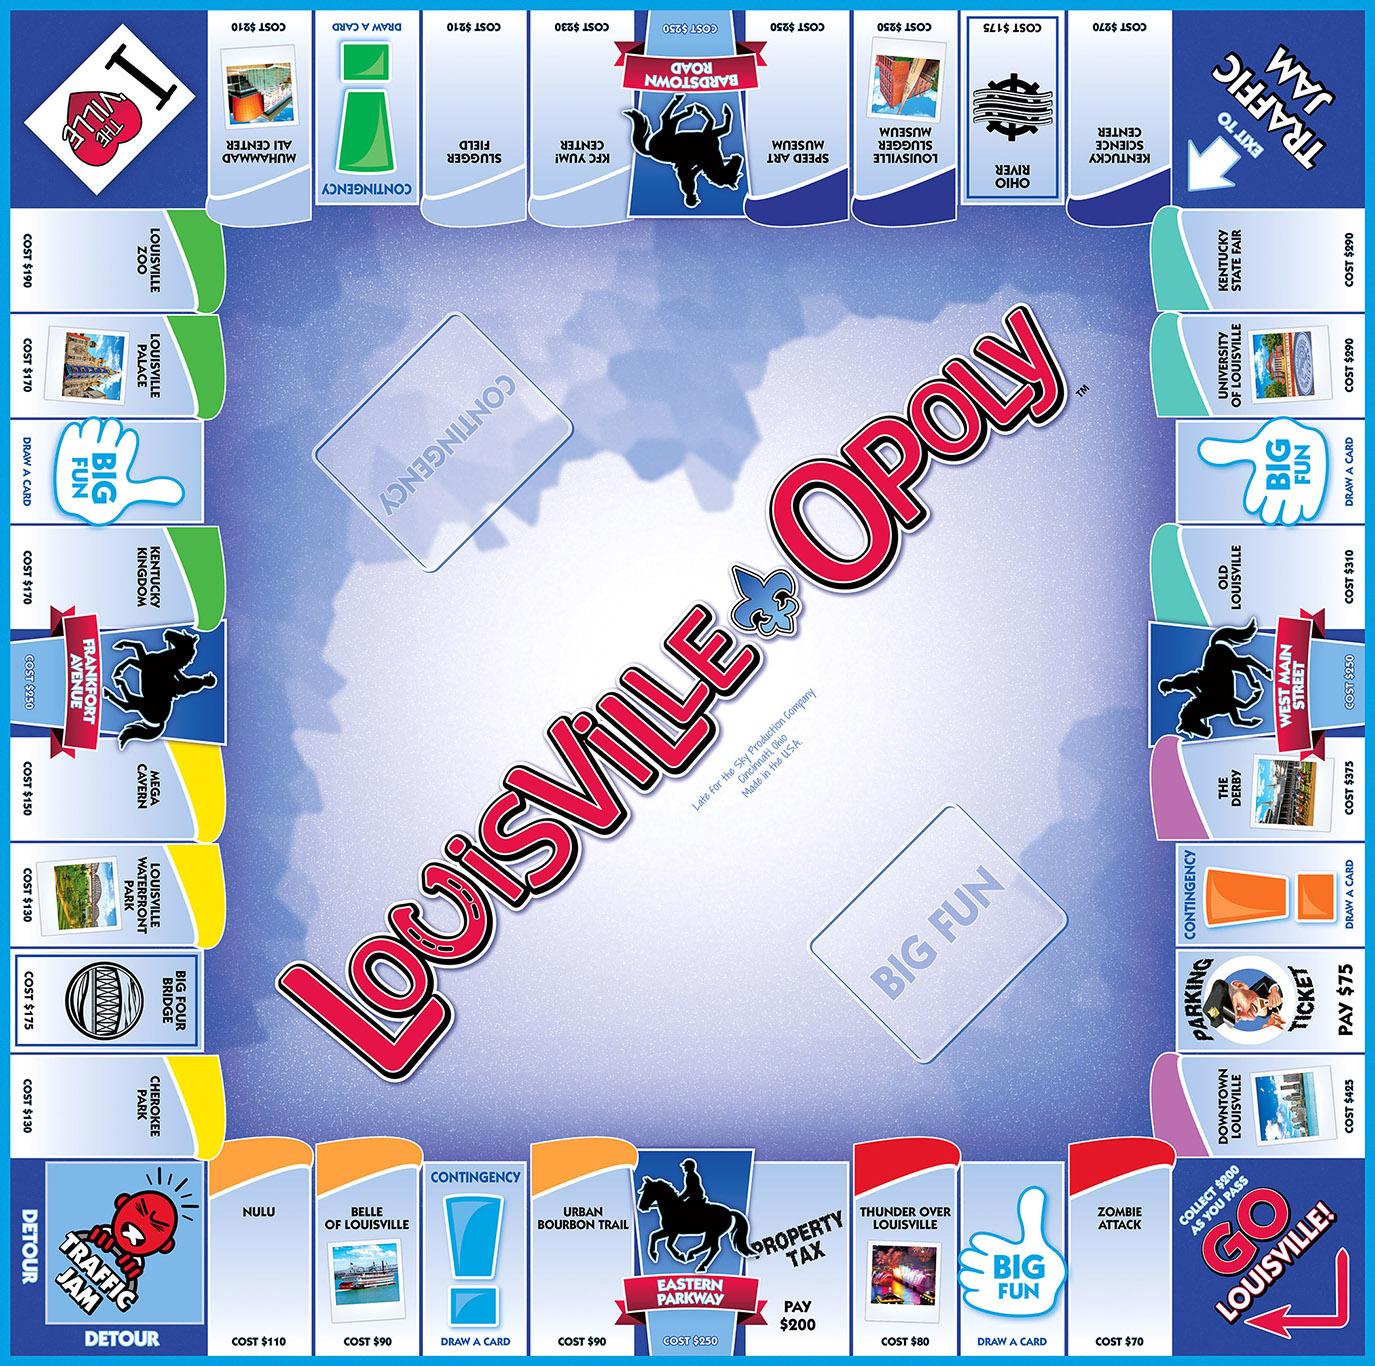 LOUISVILLE-OPOLY Board Game